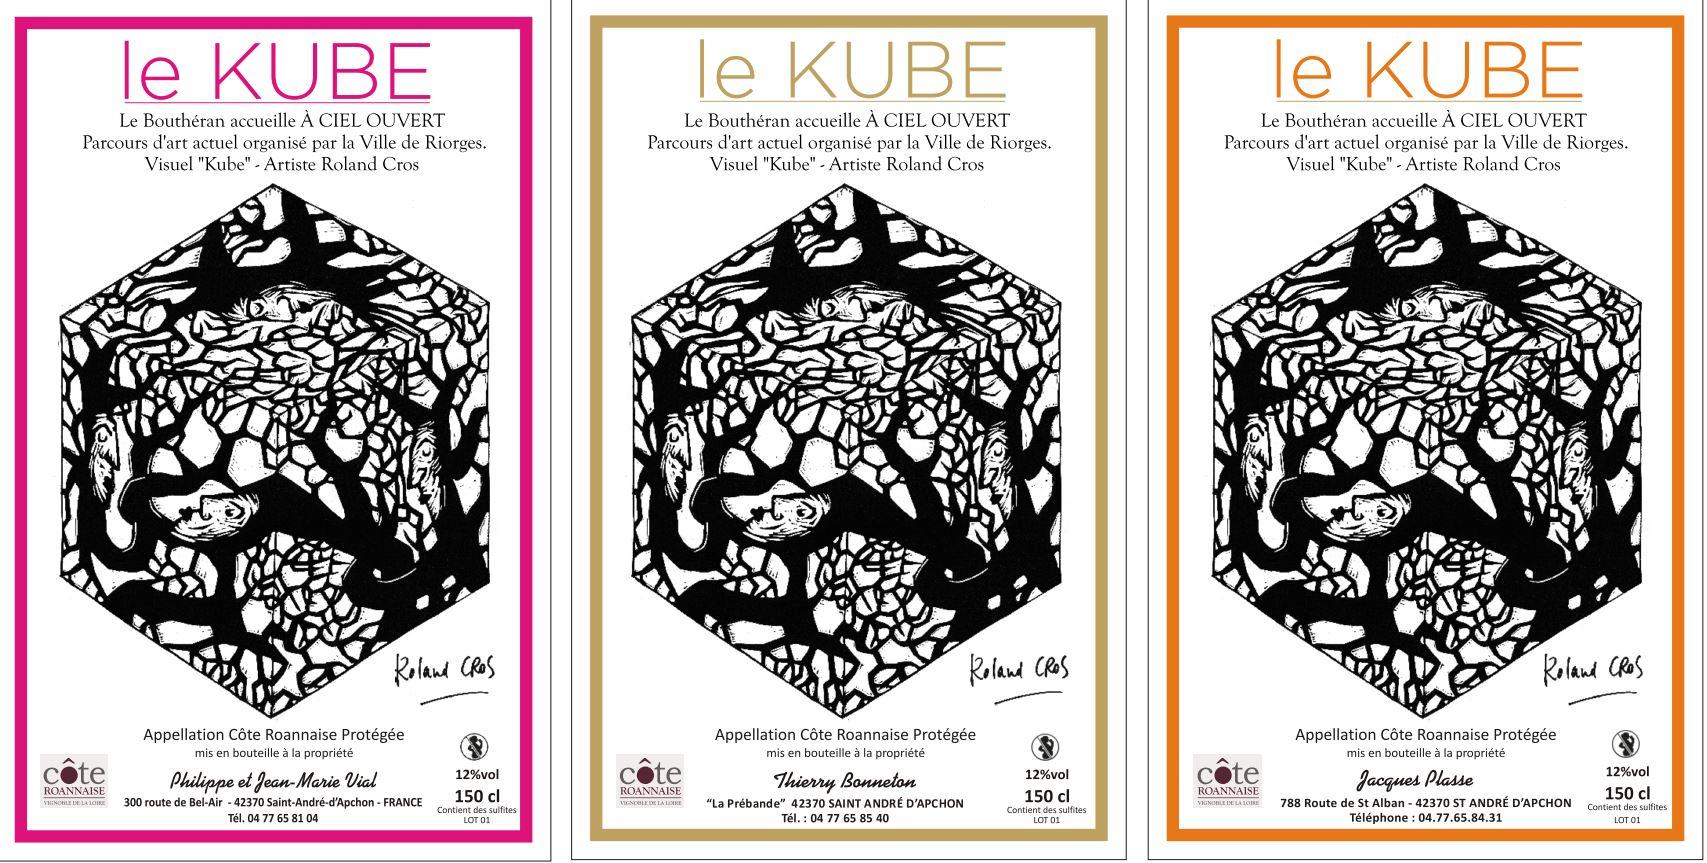 Capture-etiquette-kube-1525811129.JPG